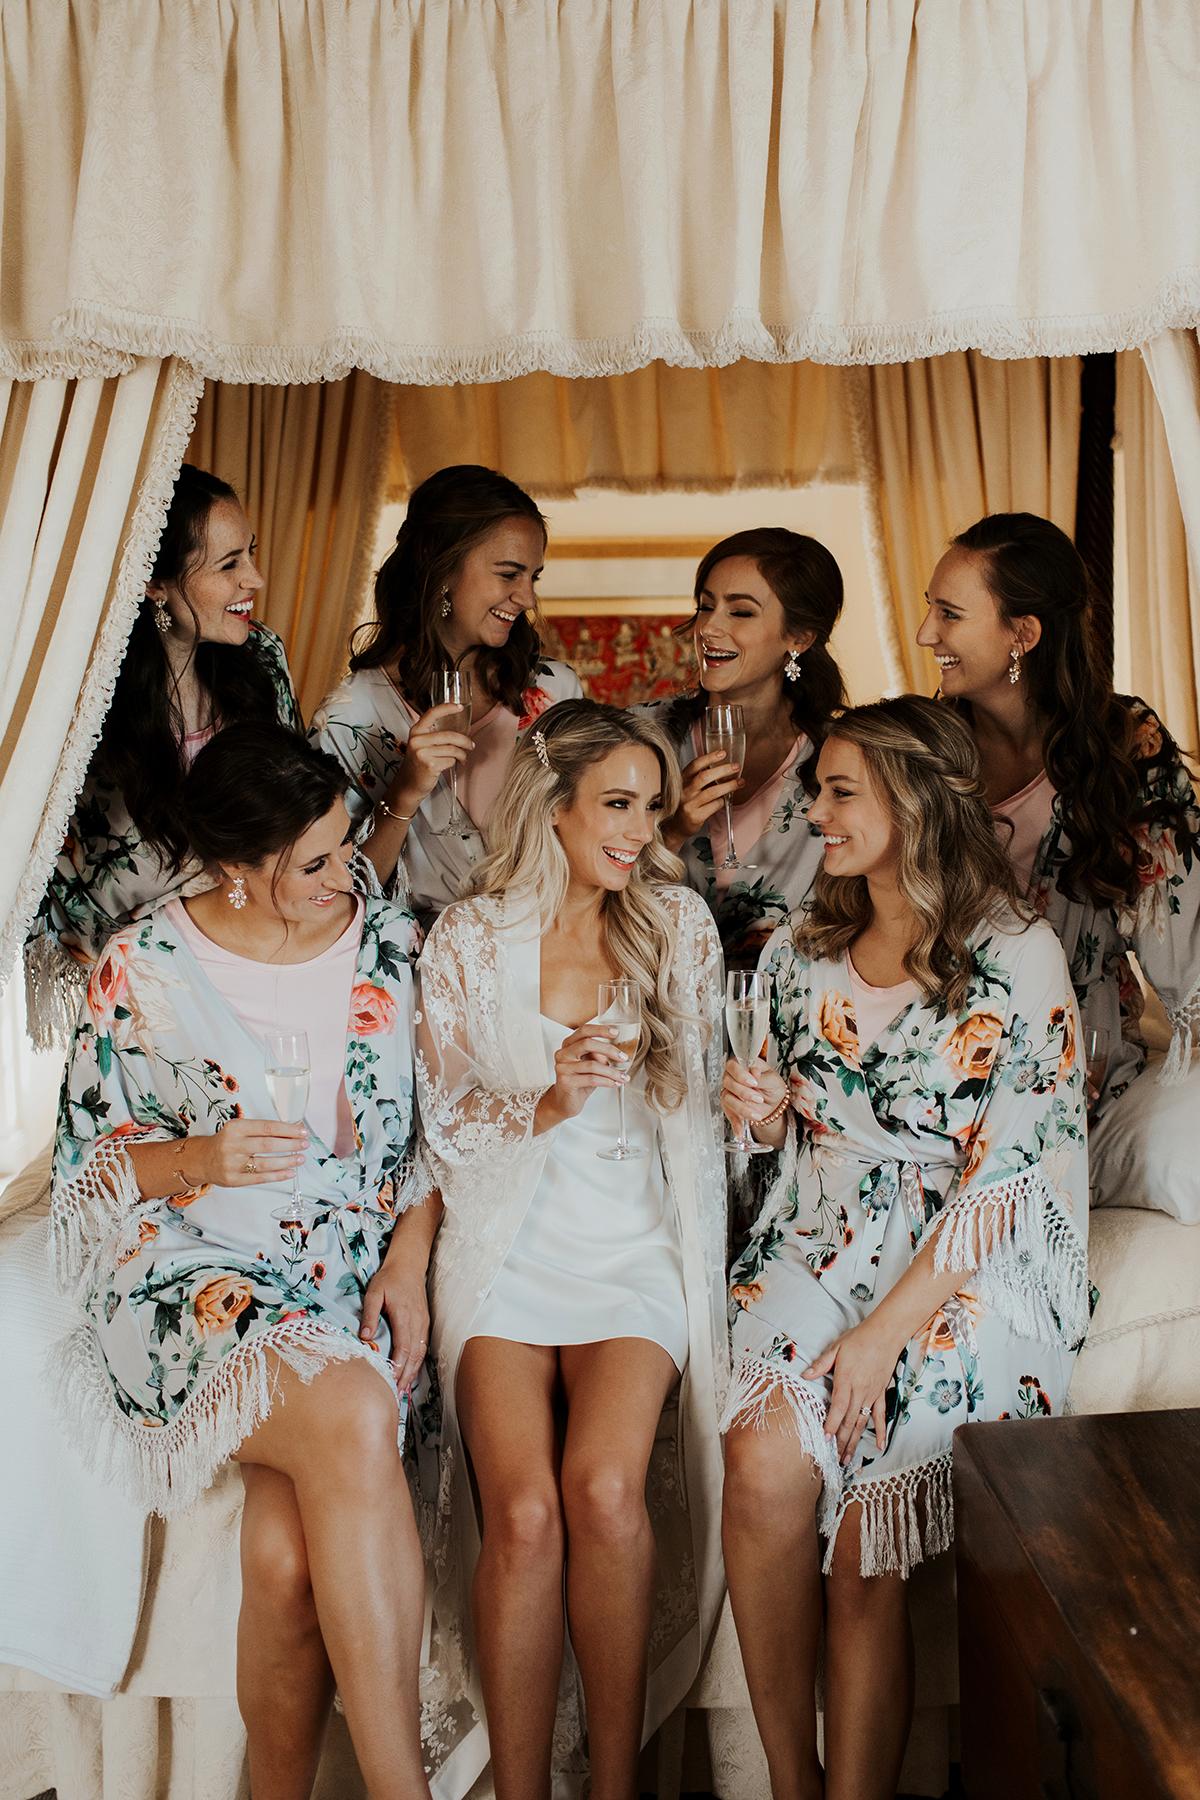 Katies Bliss Wedding Getting Ready Photos